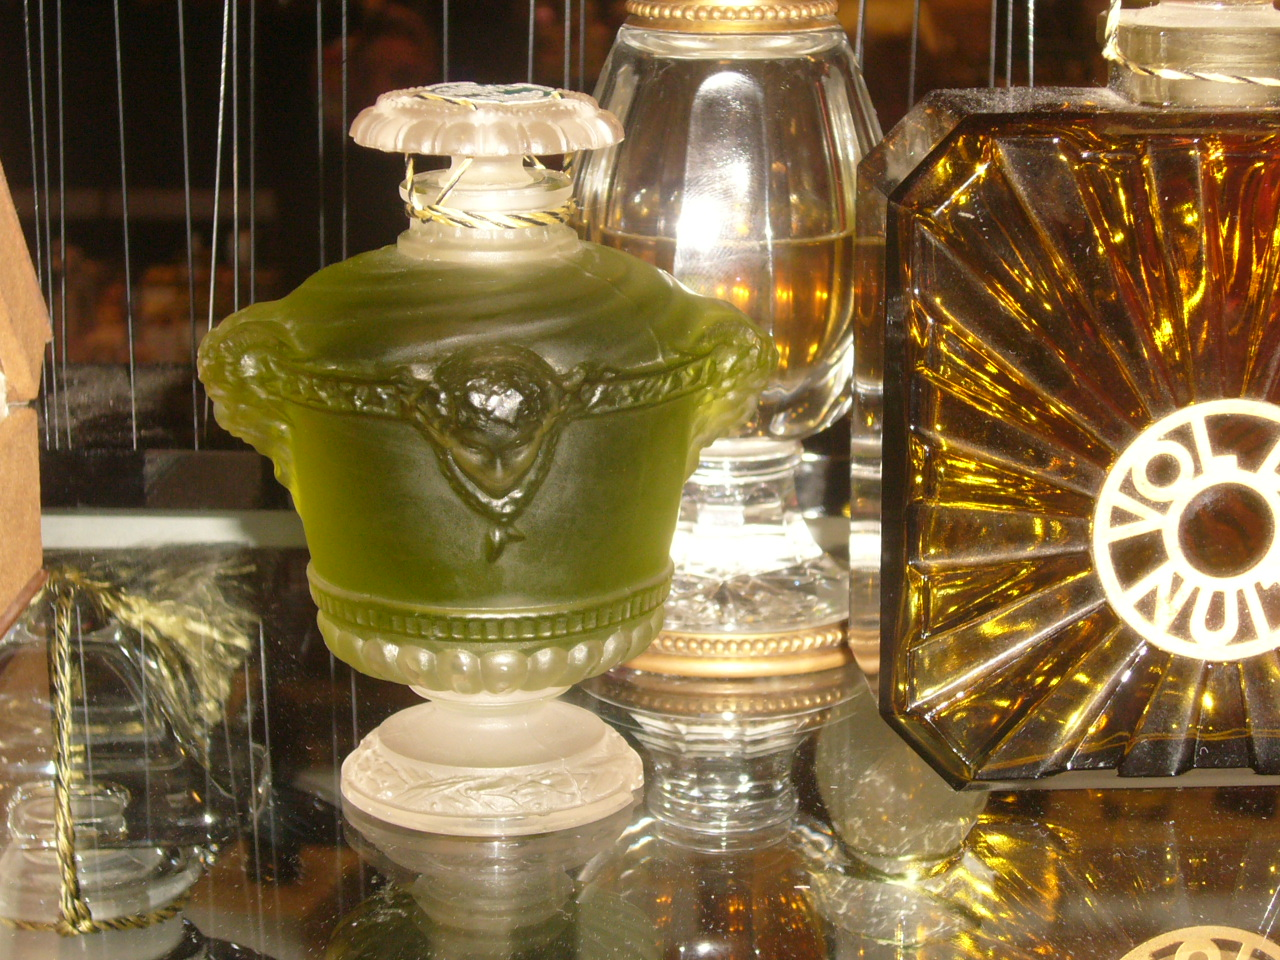 http://www.ljplus.ru/img4/m/i/milkshake_m/Le-bouquet-de-faune_-Guerlain-1925_-RenG_-Lalique.jpg